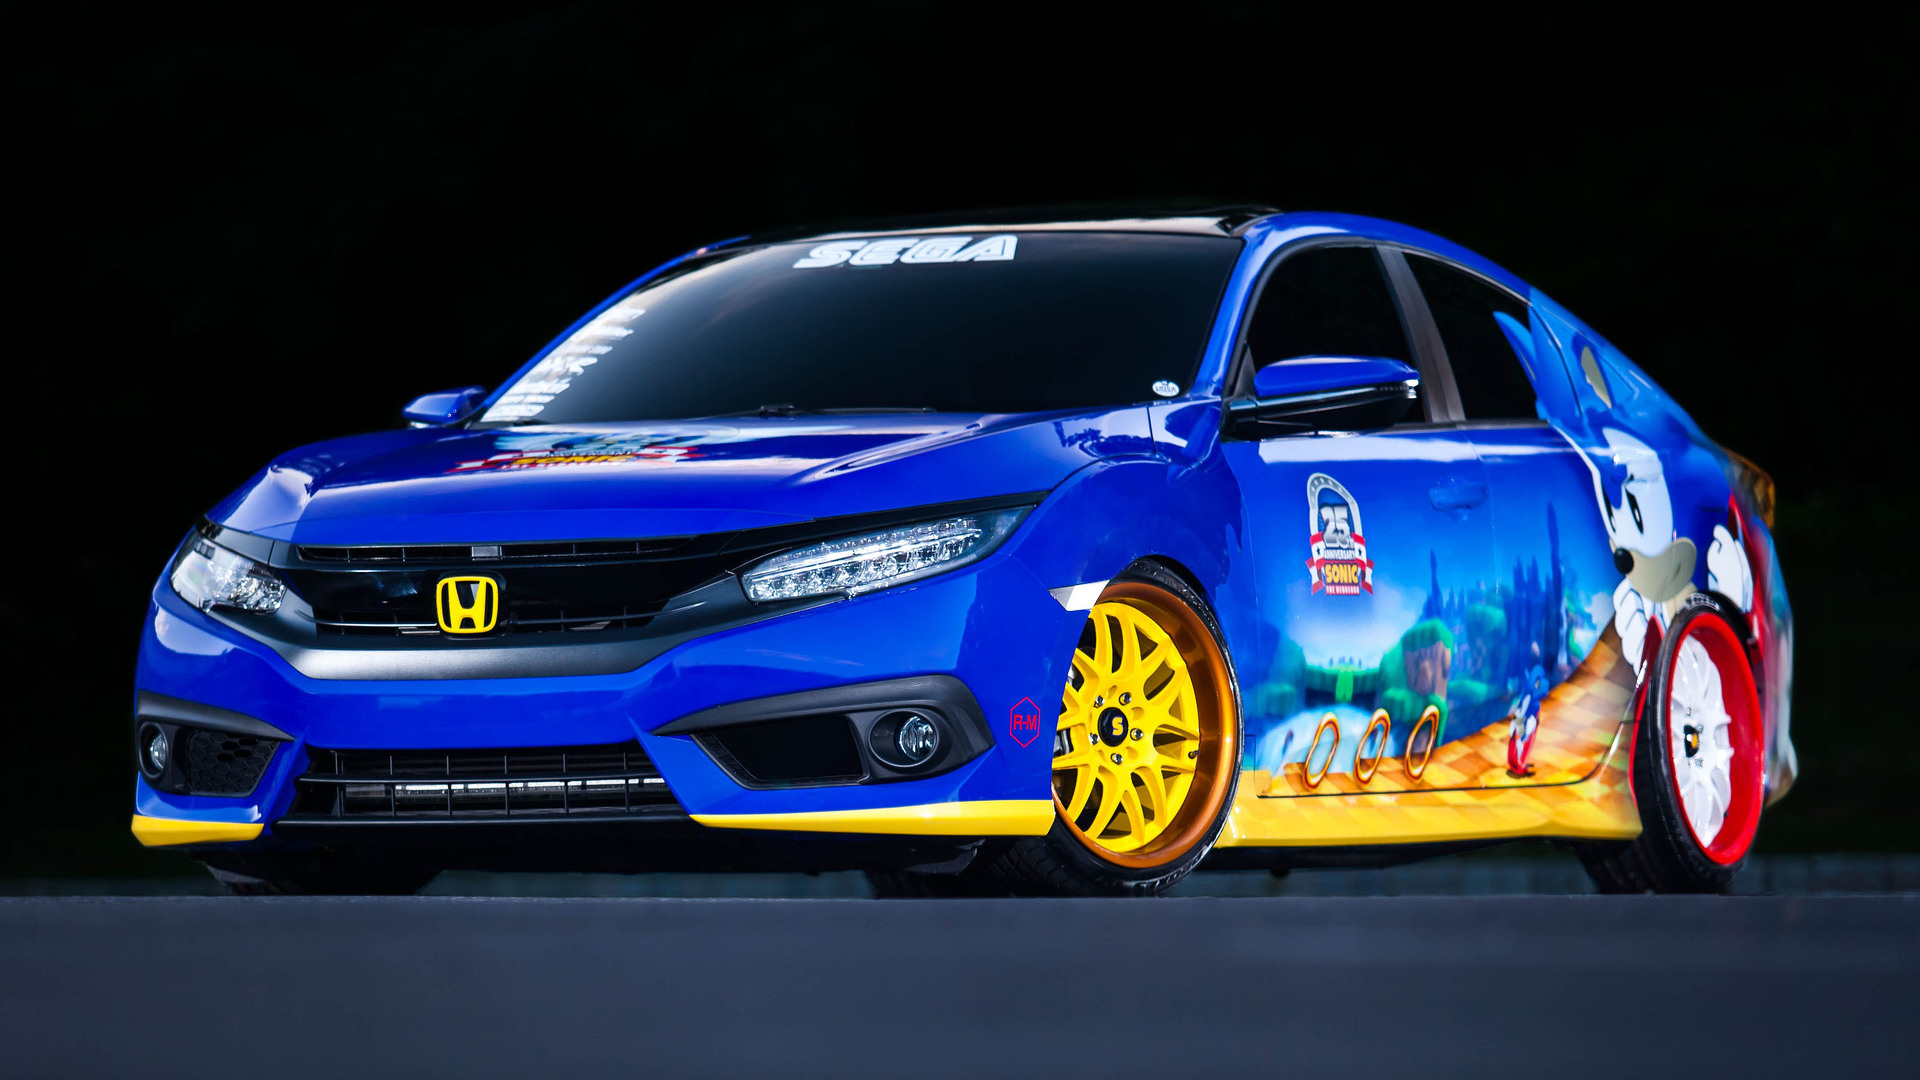 Honda Celebrates 25th Anniversary of Sonic - Image 02